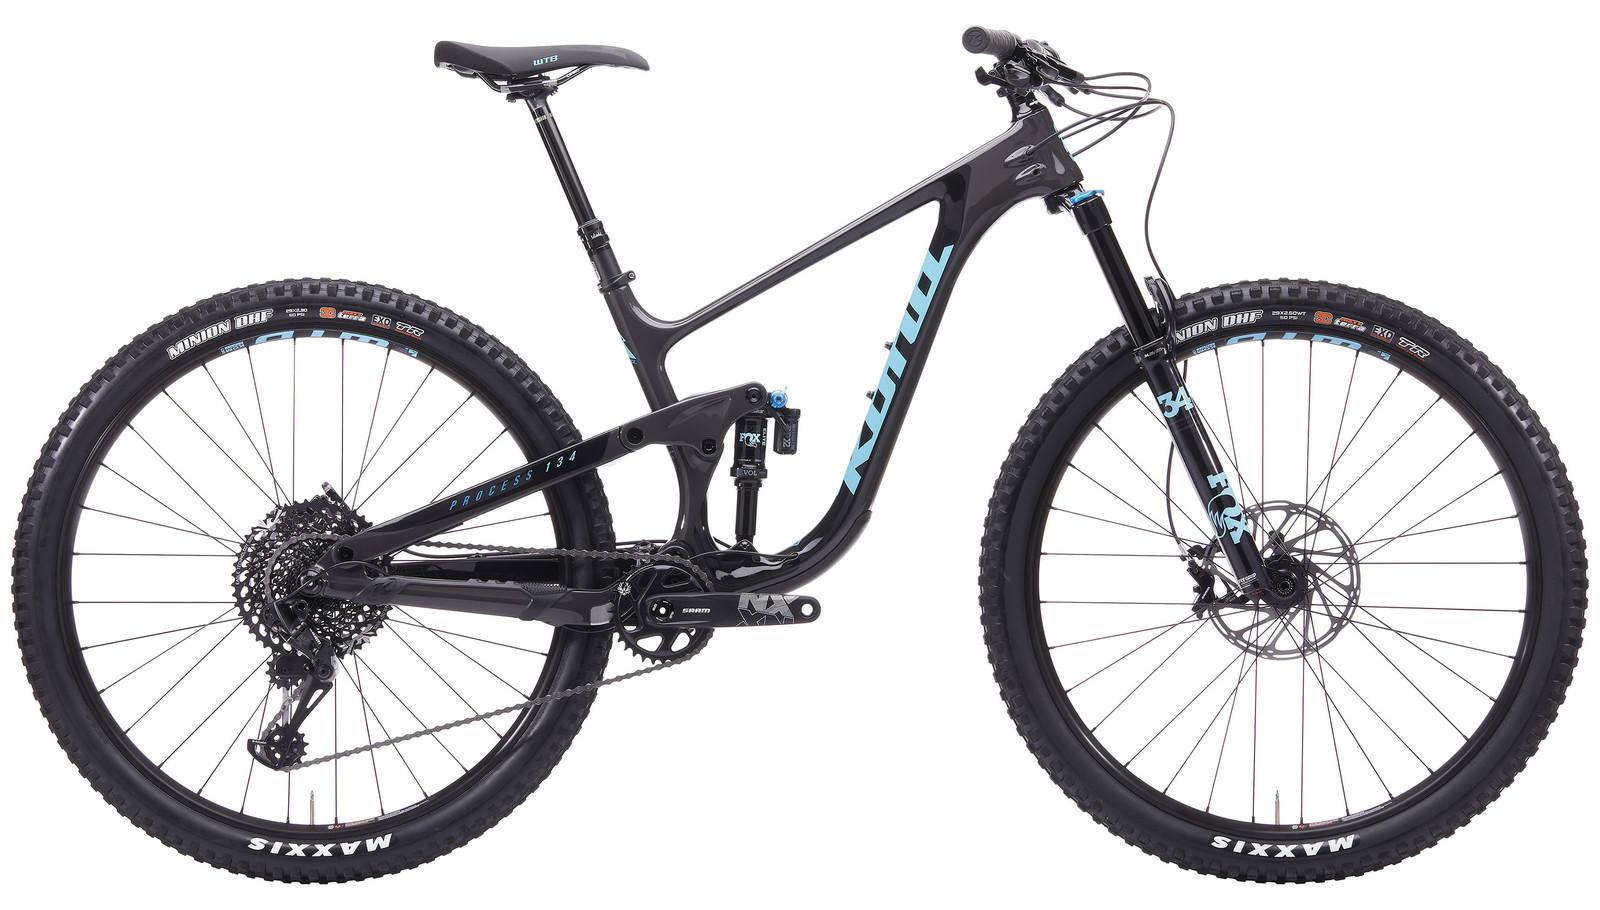 Kona Process 134 Cr Dl 29 Bike